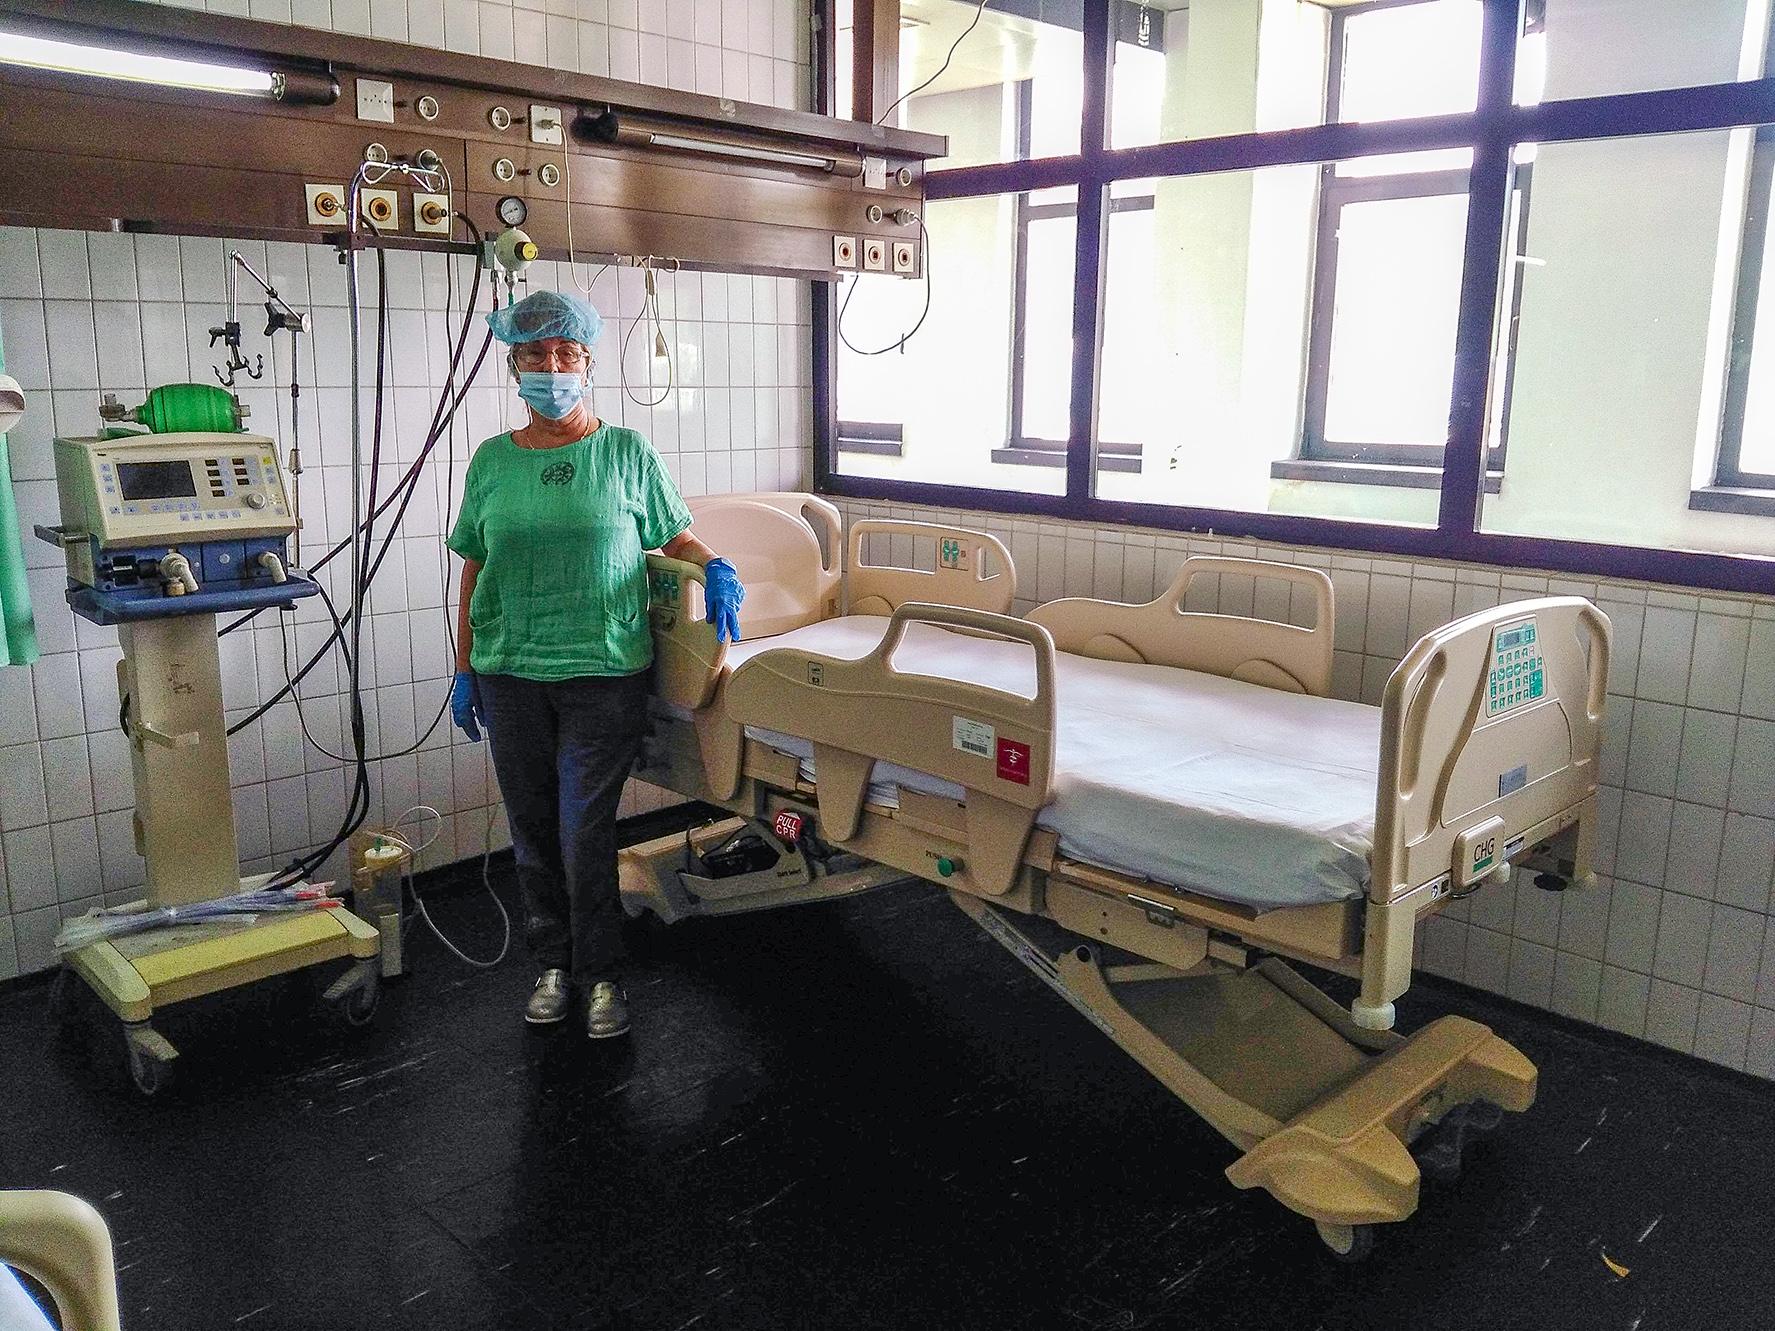 PRINCESS KATHERINE FOUNDATION DONATES ELECTRIC BEDS AND MATTRESSES VALUE OVER 28,500 EUROS FOR VALJEVO HOSPITAL